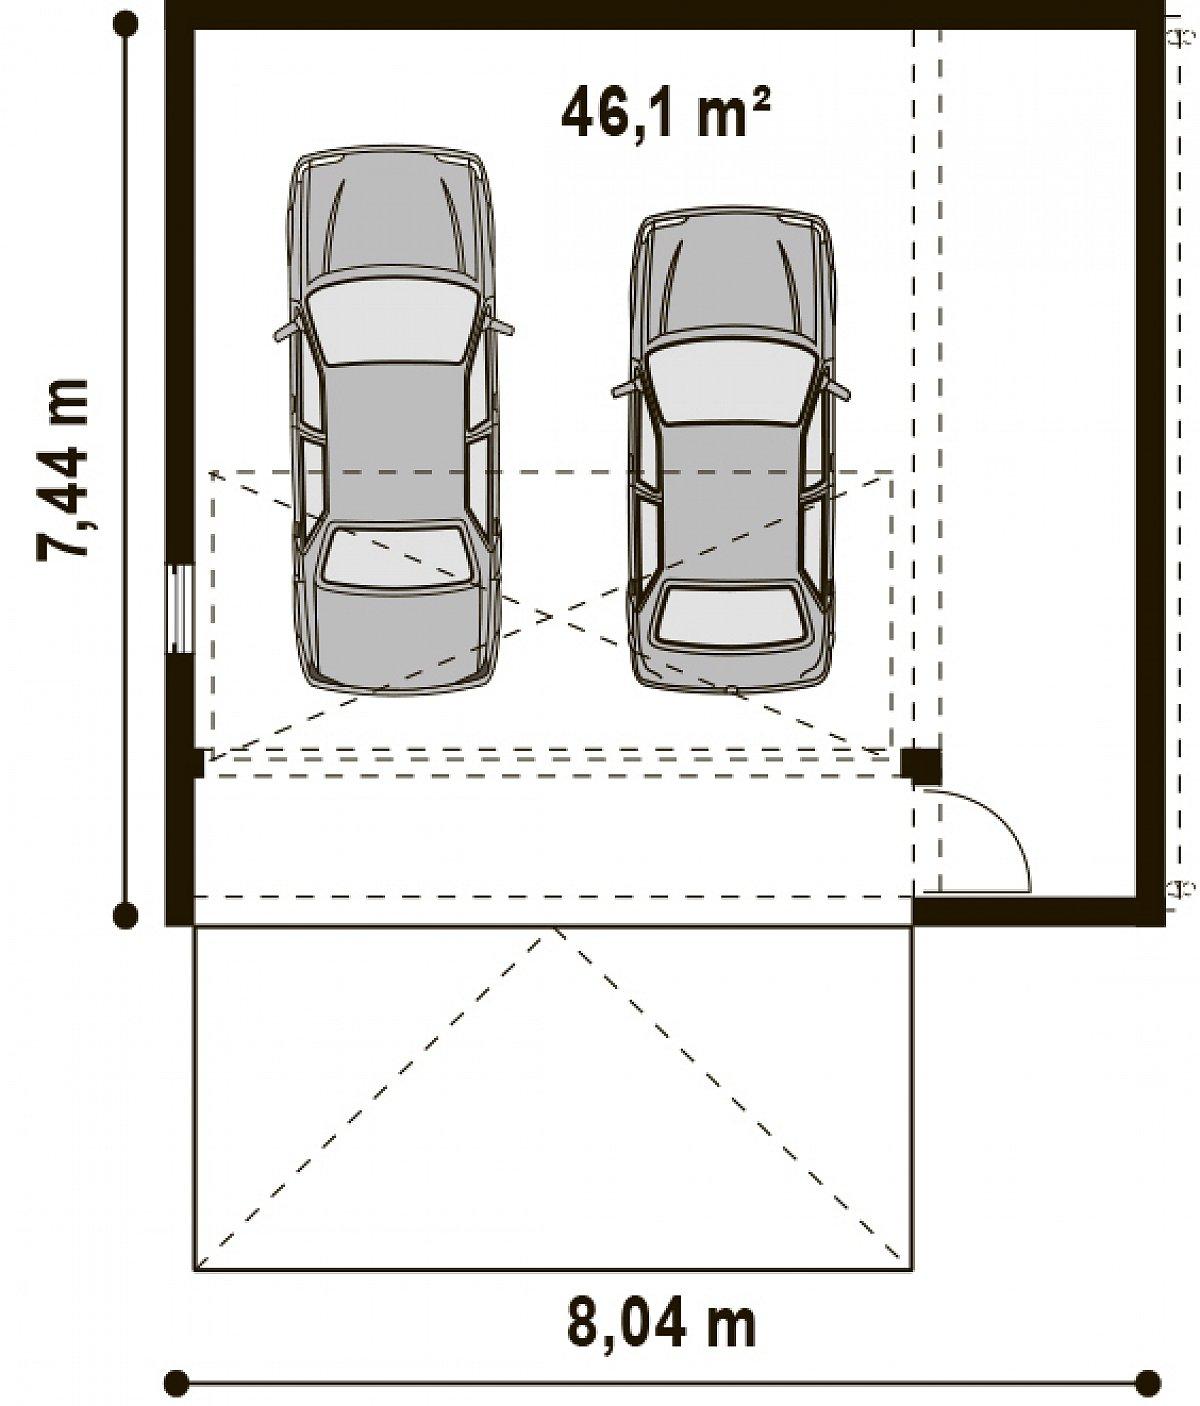 Площадь 46,1м² гаража Zg16